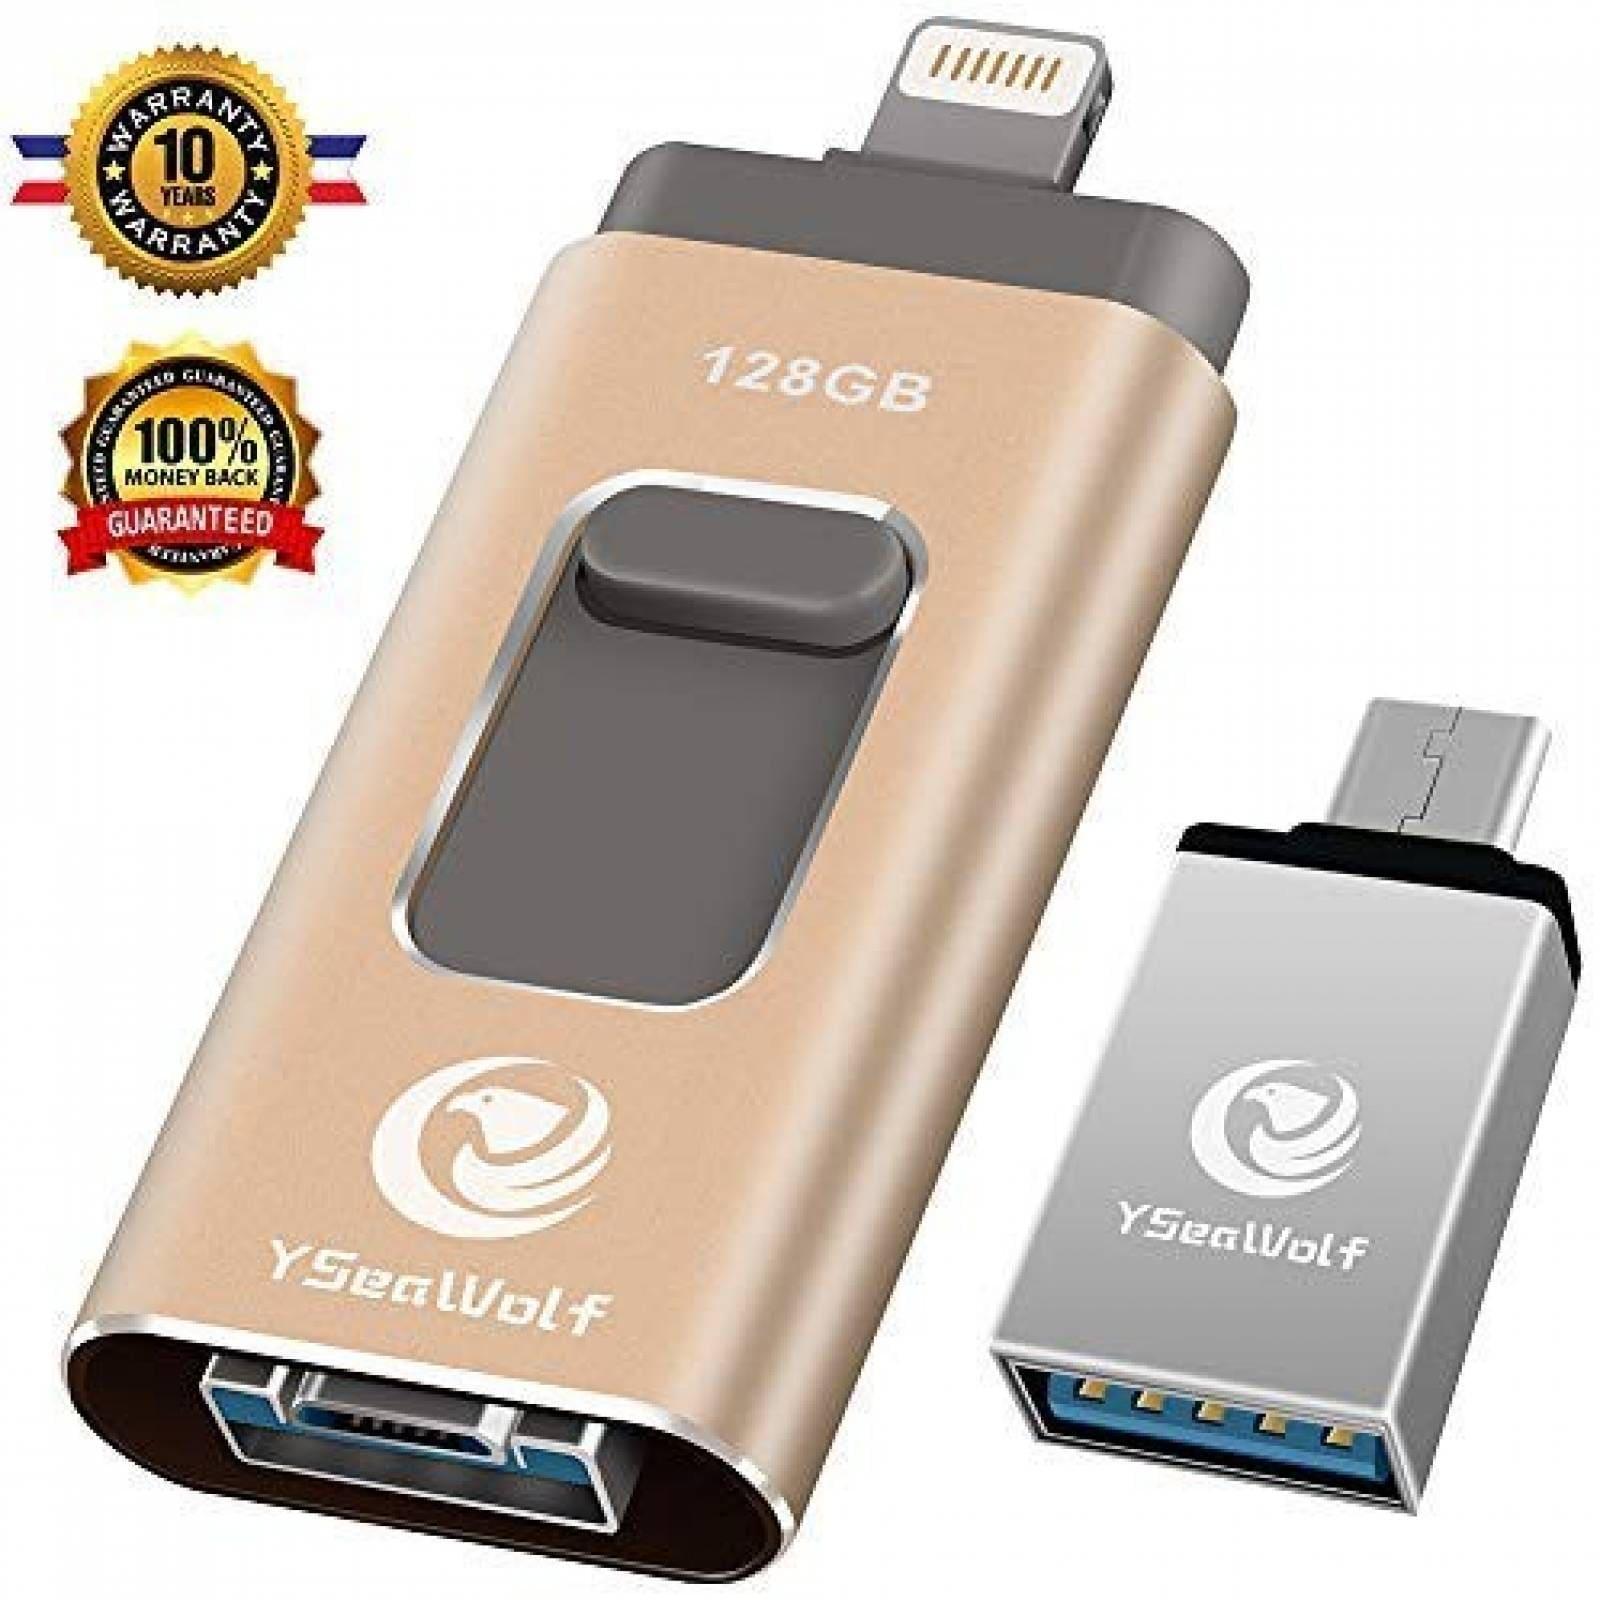 Memoria flash USB YSeaWolf Para iPhone 128GB -Dorado